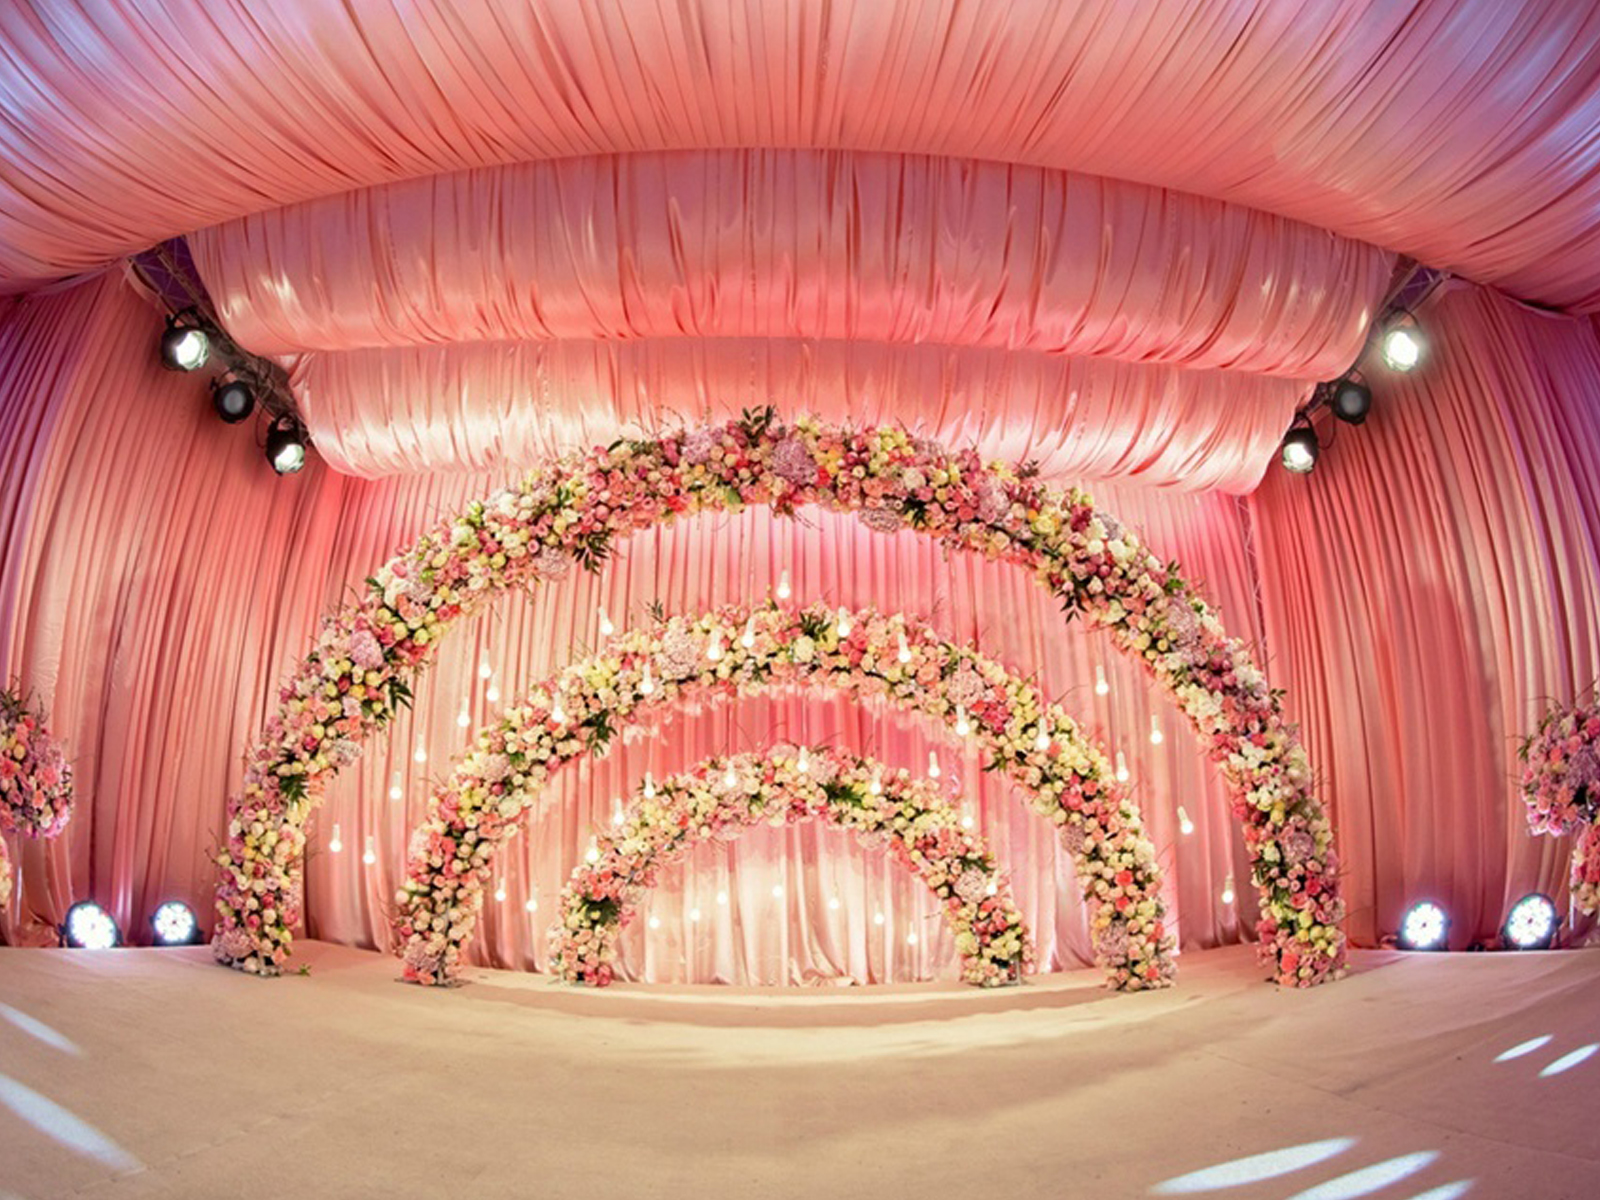 结婚纪�y��yd�&����_小清新婚礼布置,婚礼布置图库,婚礼纪www.hunliji.com